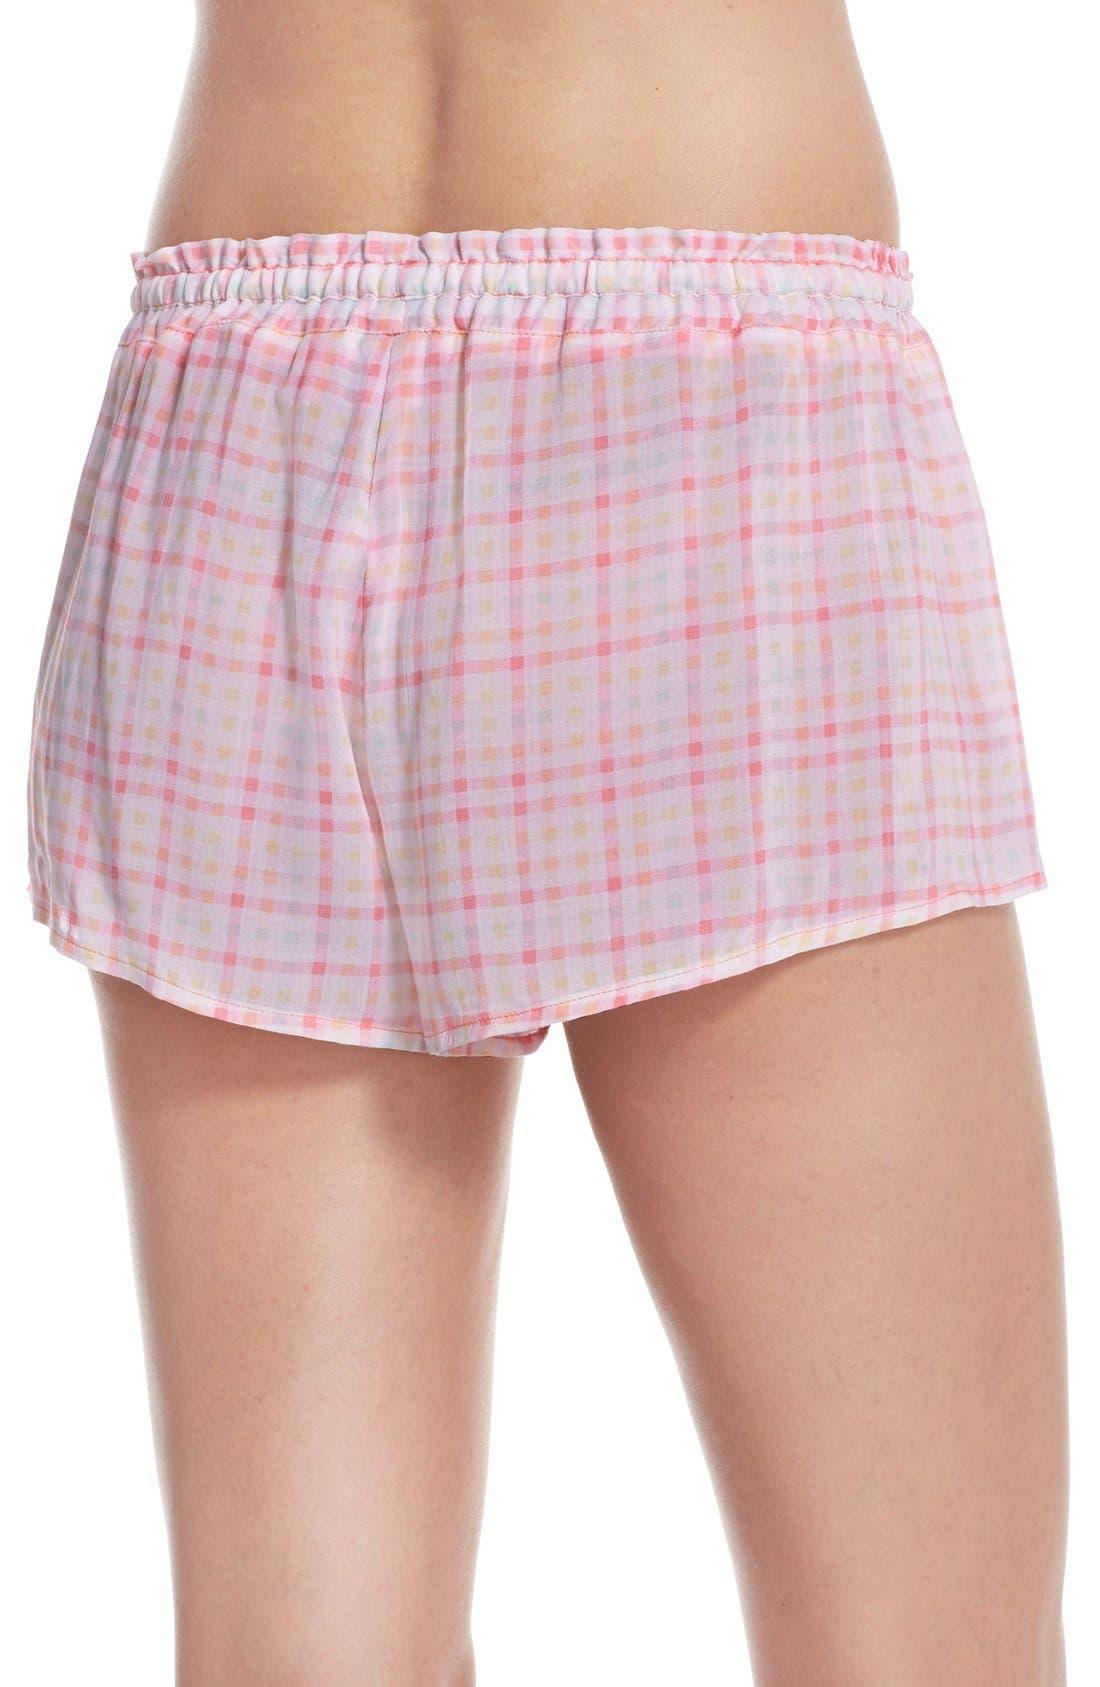 Alternate Image 2  - Make + Model 'Smock' Lounge Shorts